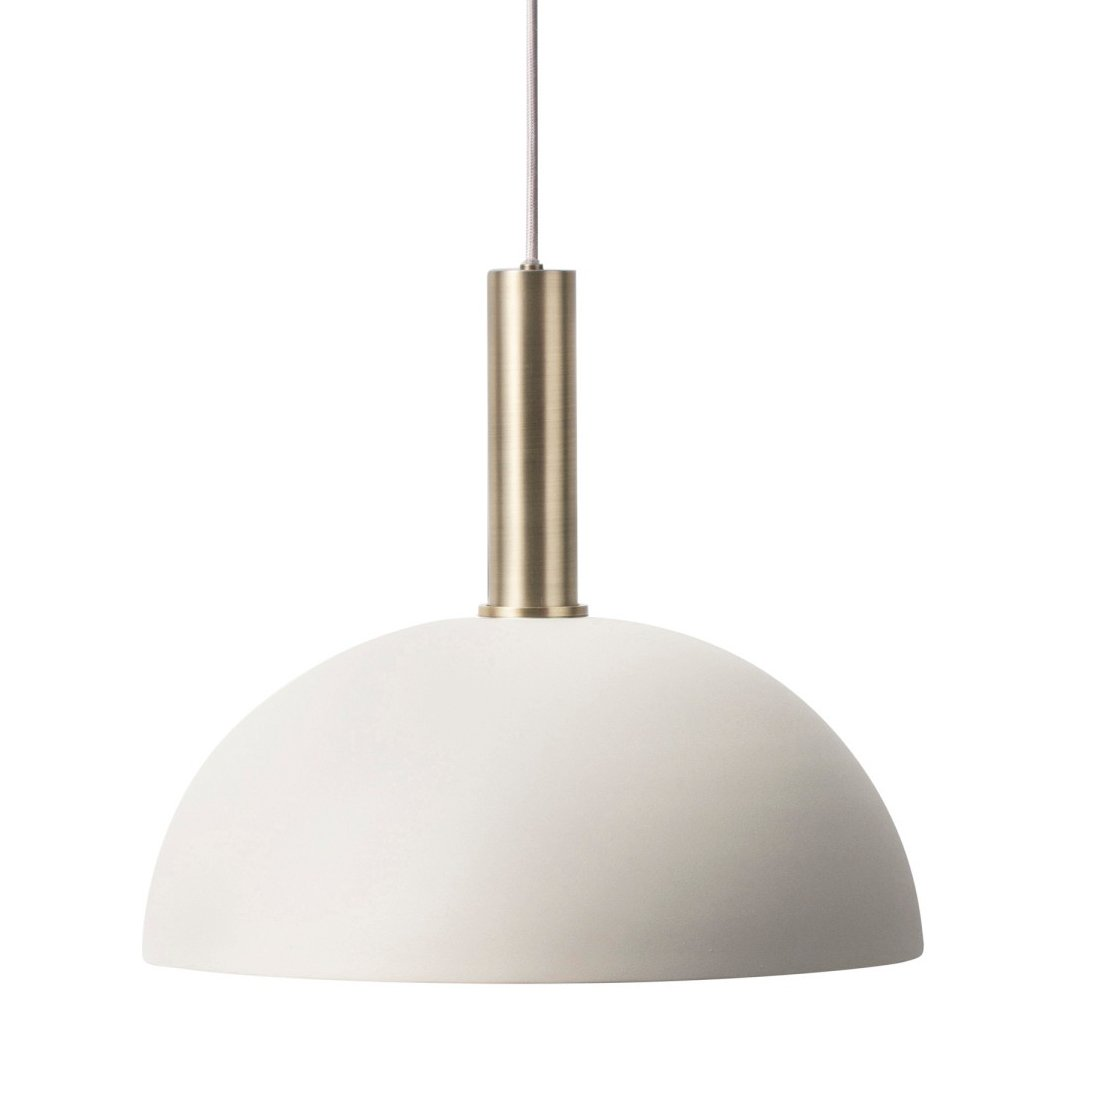 Ferm Living Collect Dome Lichtgrijs High Hanglamp